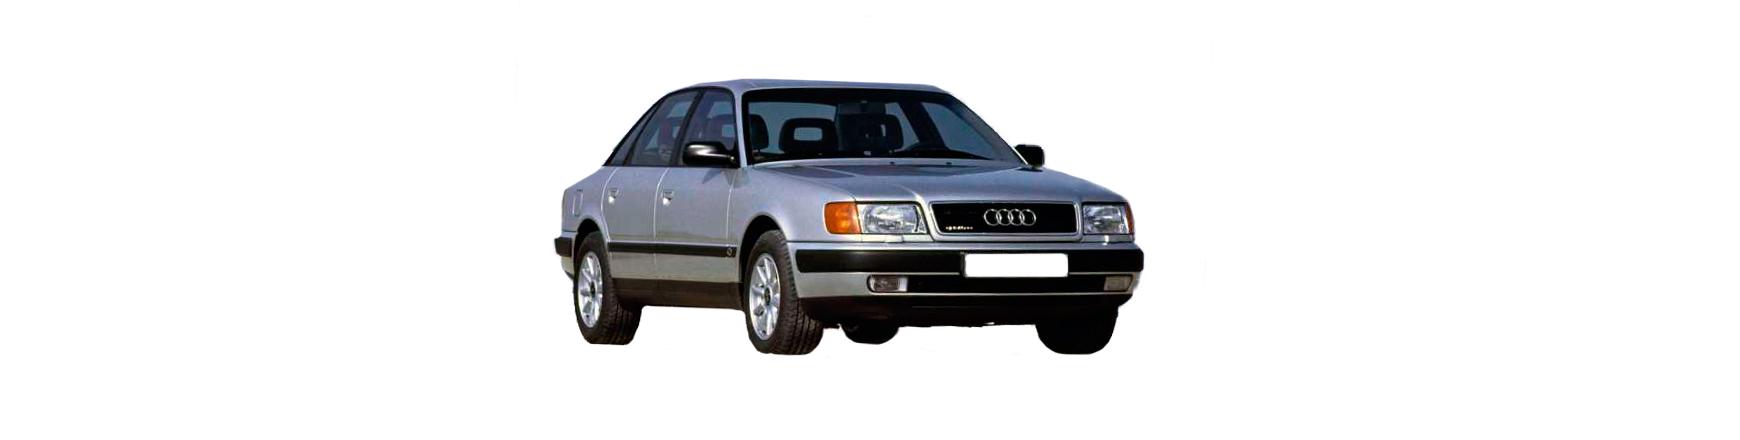 AUDI 100 1990 1991 1992 1993 1994